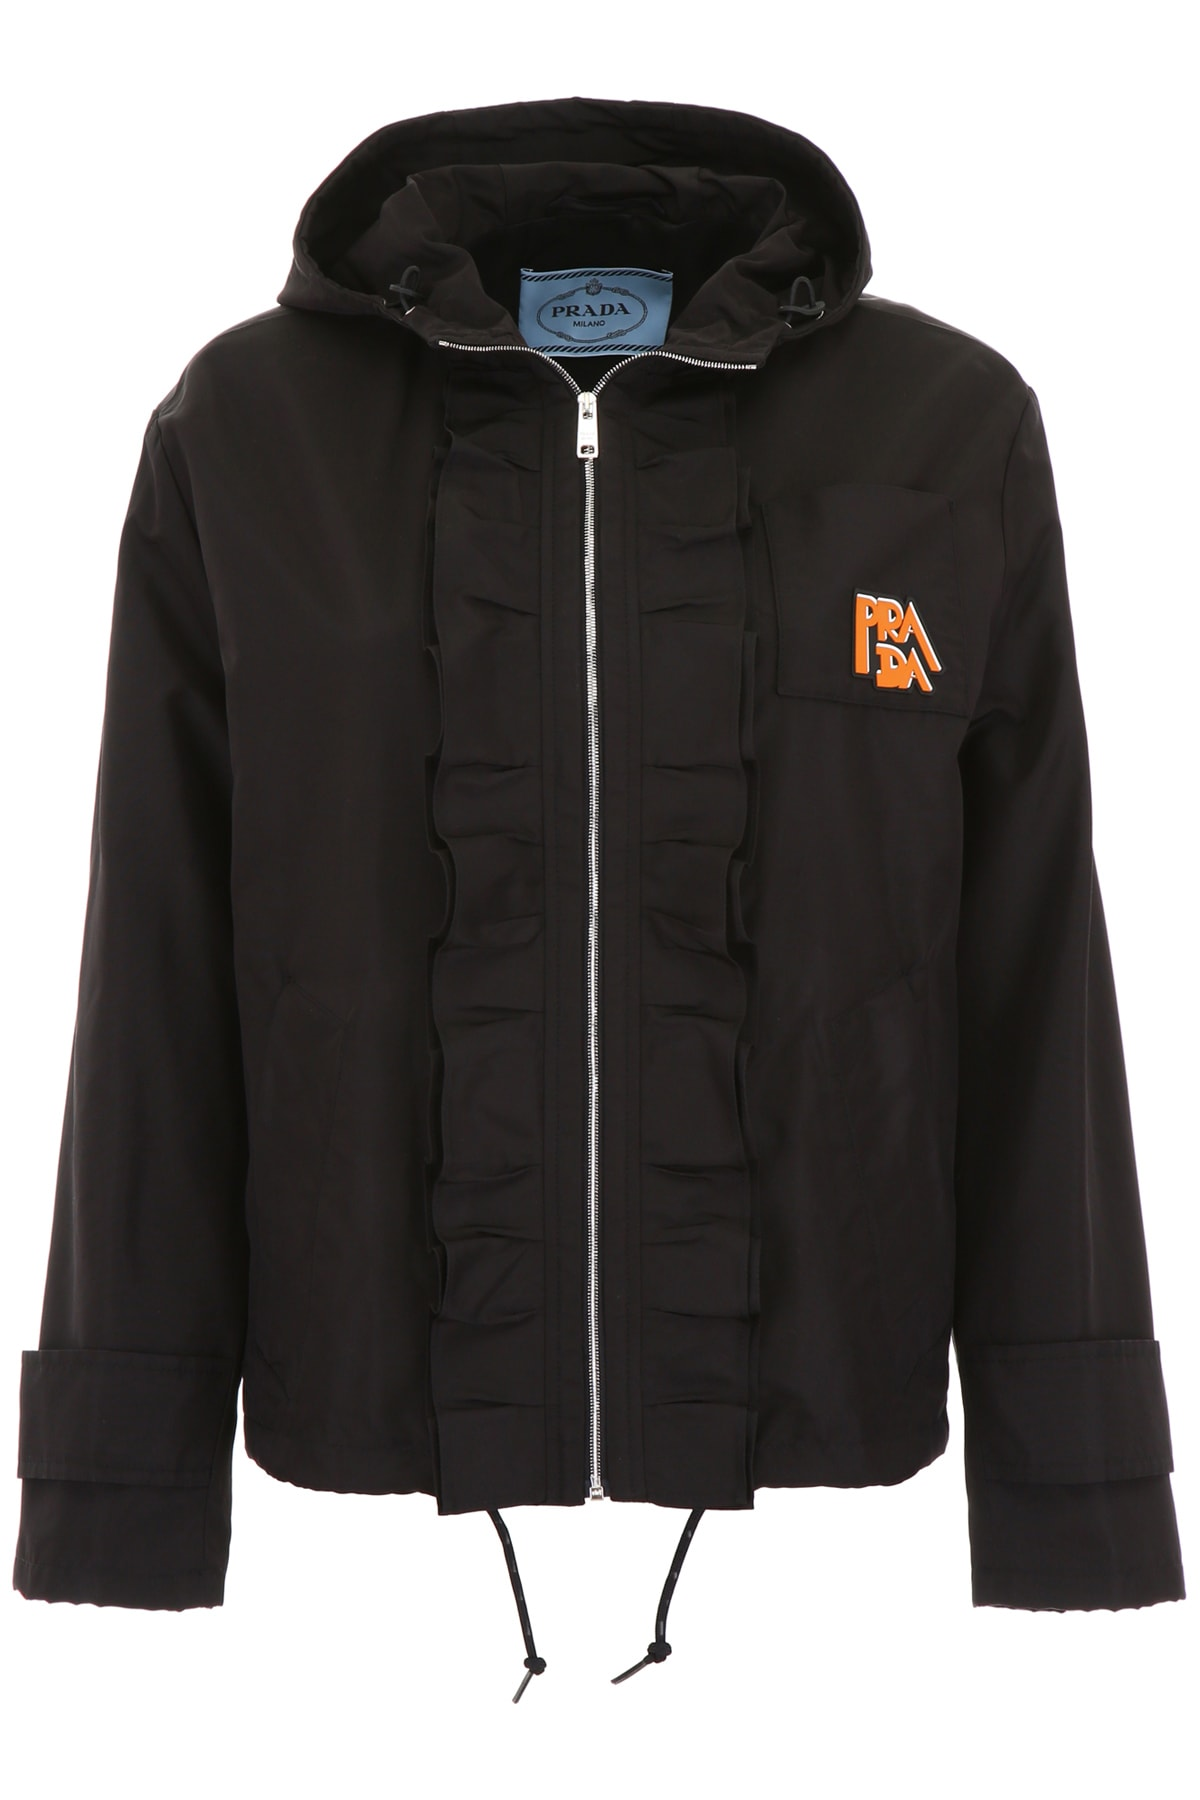 Prada Ruffled Jacket